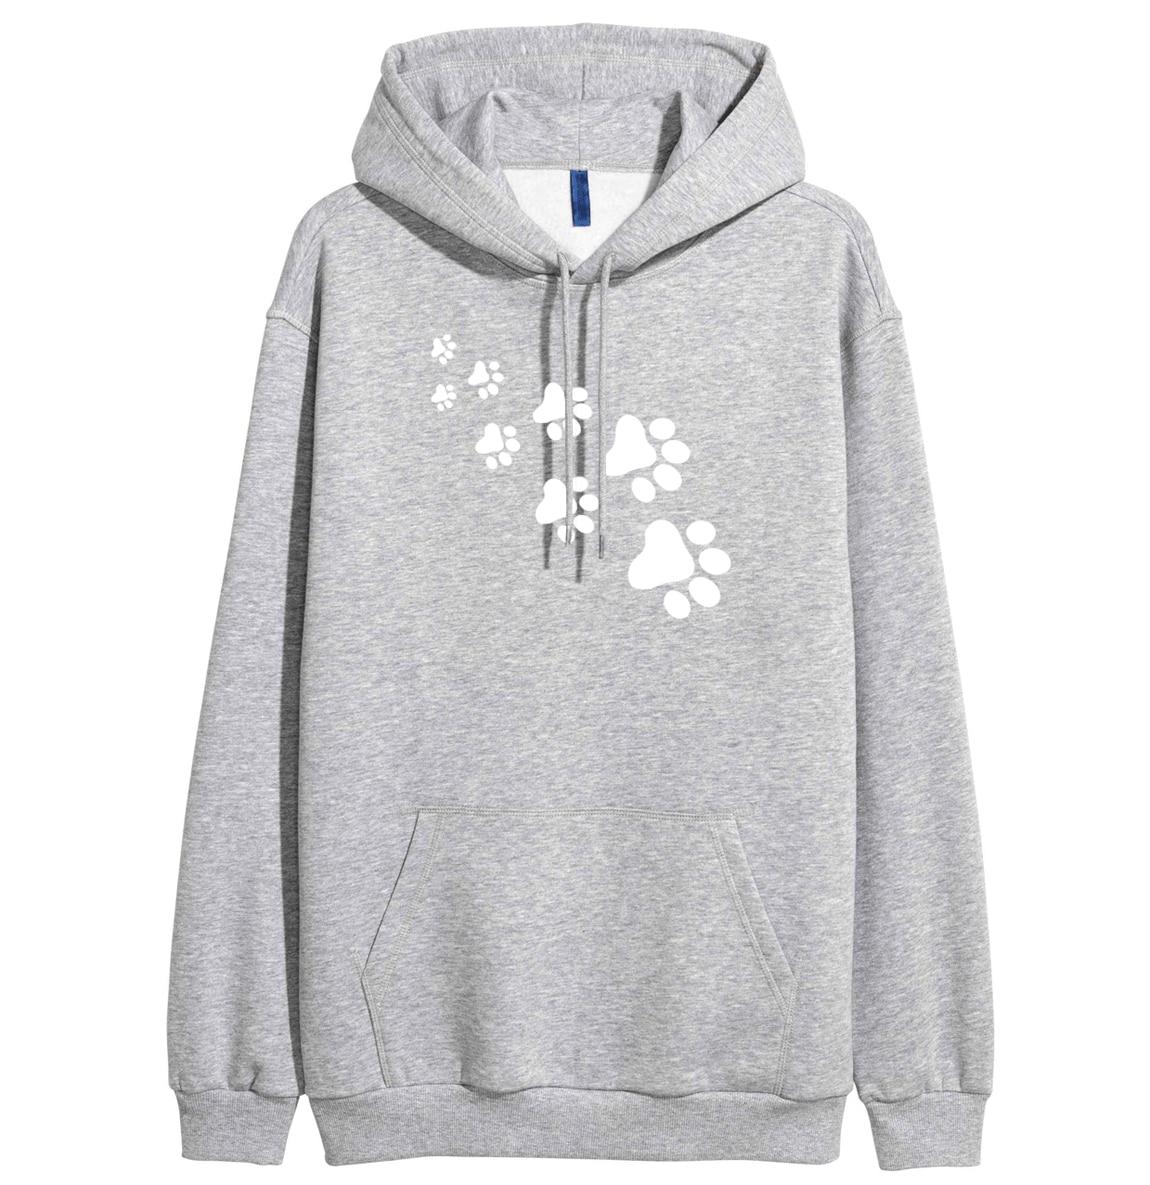 CAT PAWS Print Kawaii Fashion Streetwear Hipster 2019 Spring Winter Fleece Hoodies Swetashirt For Women Harajauku K-pop Crossfit